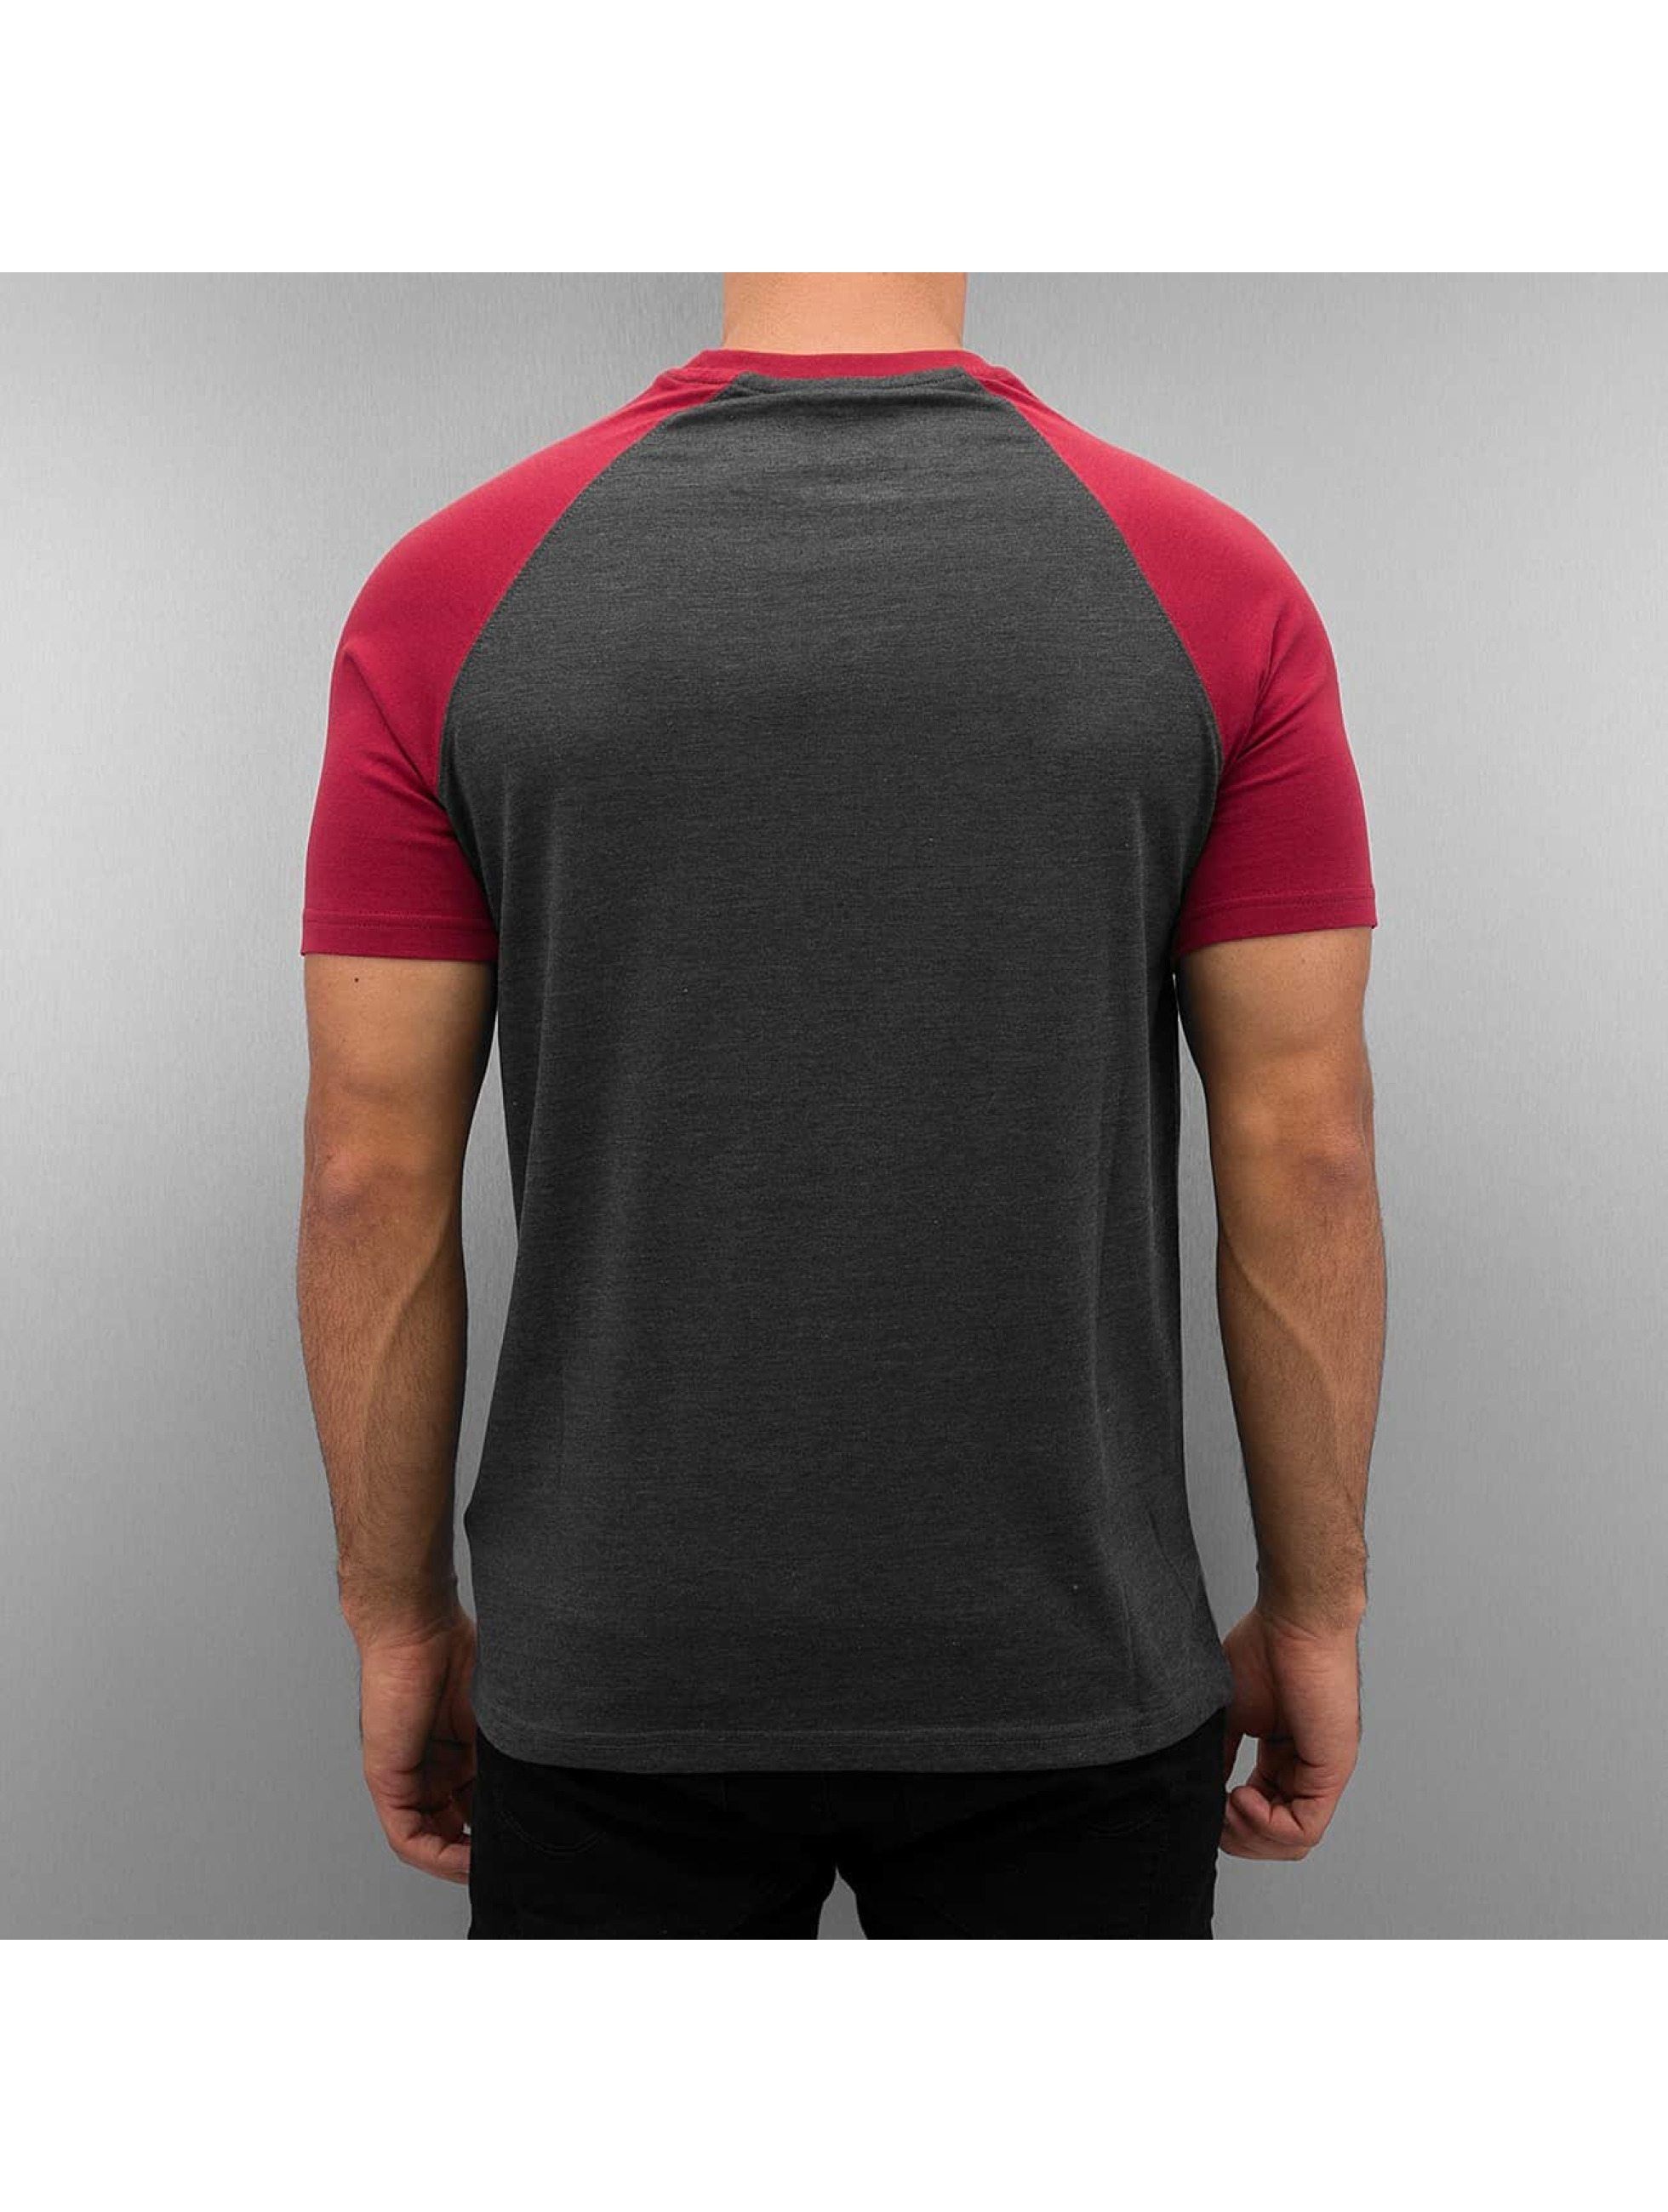 Cyprime T-shirt Raglan röd